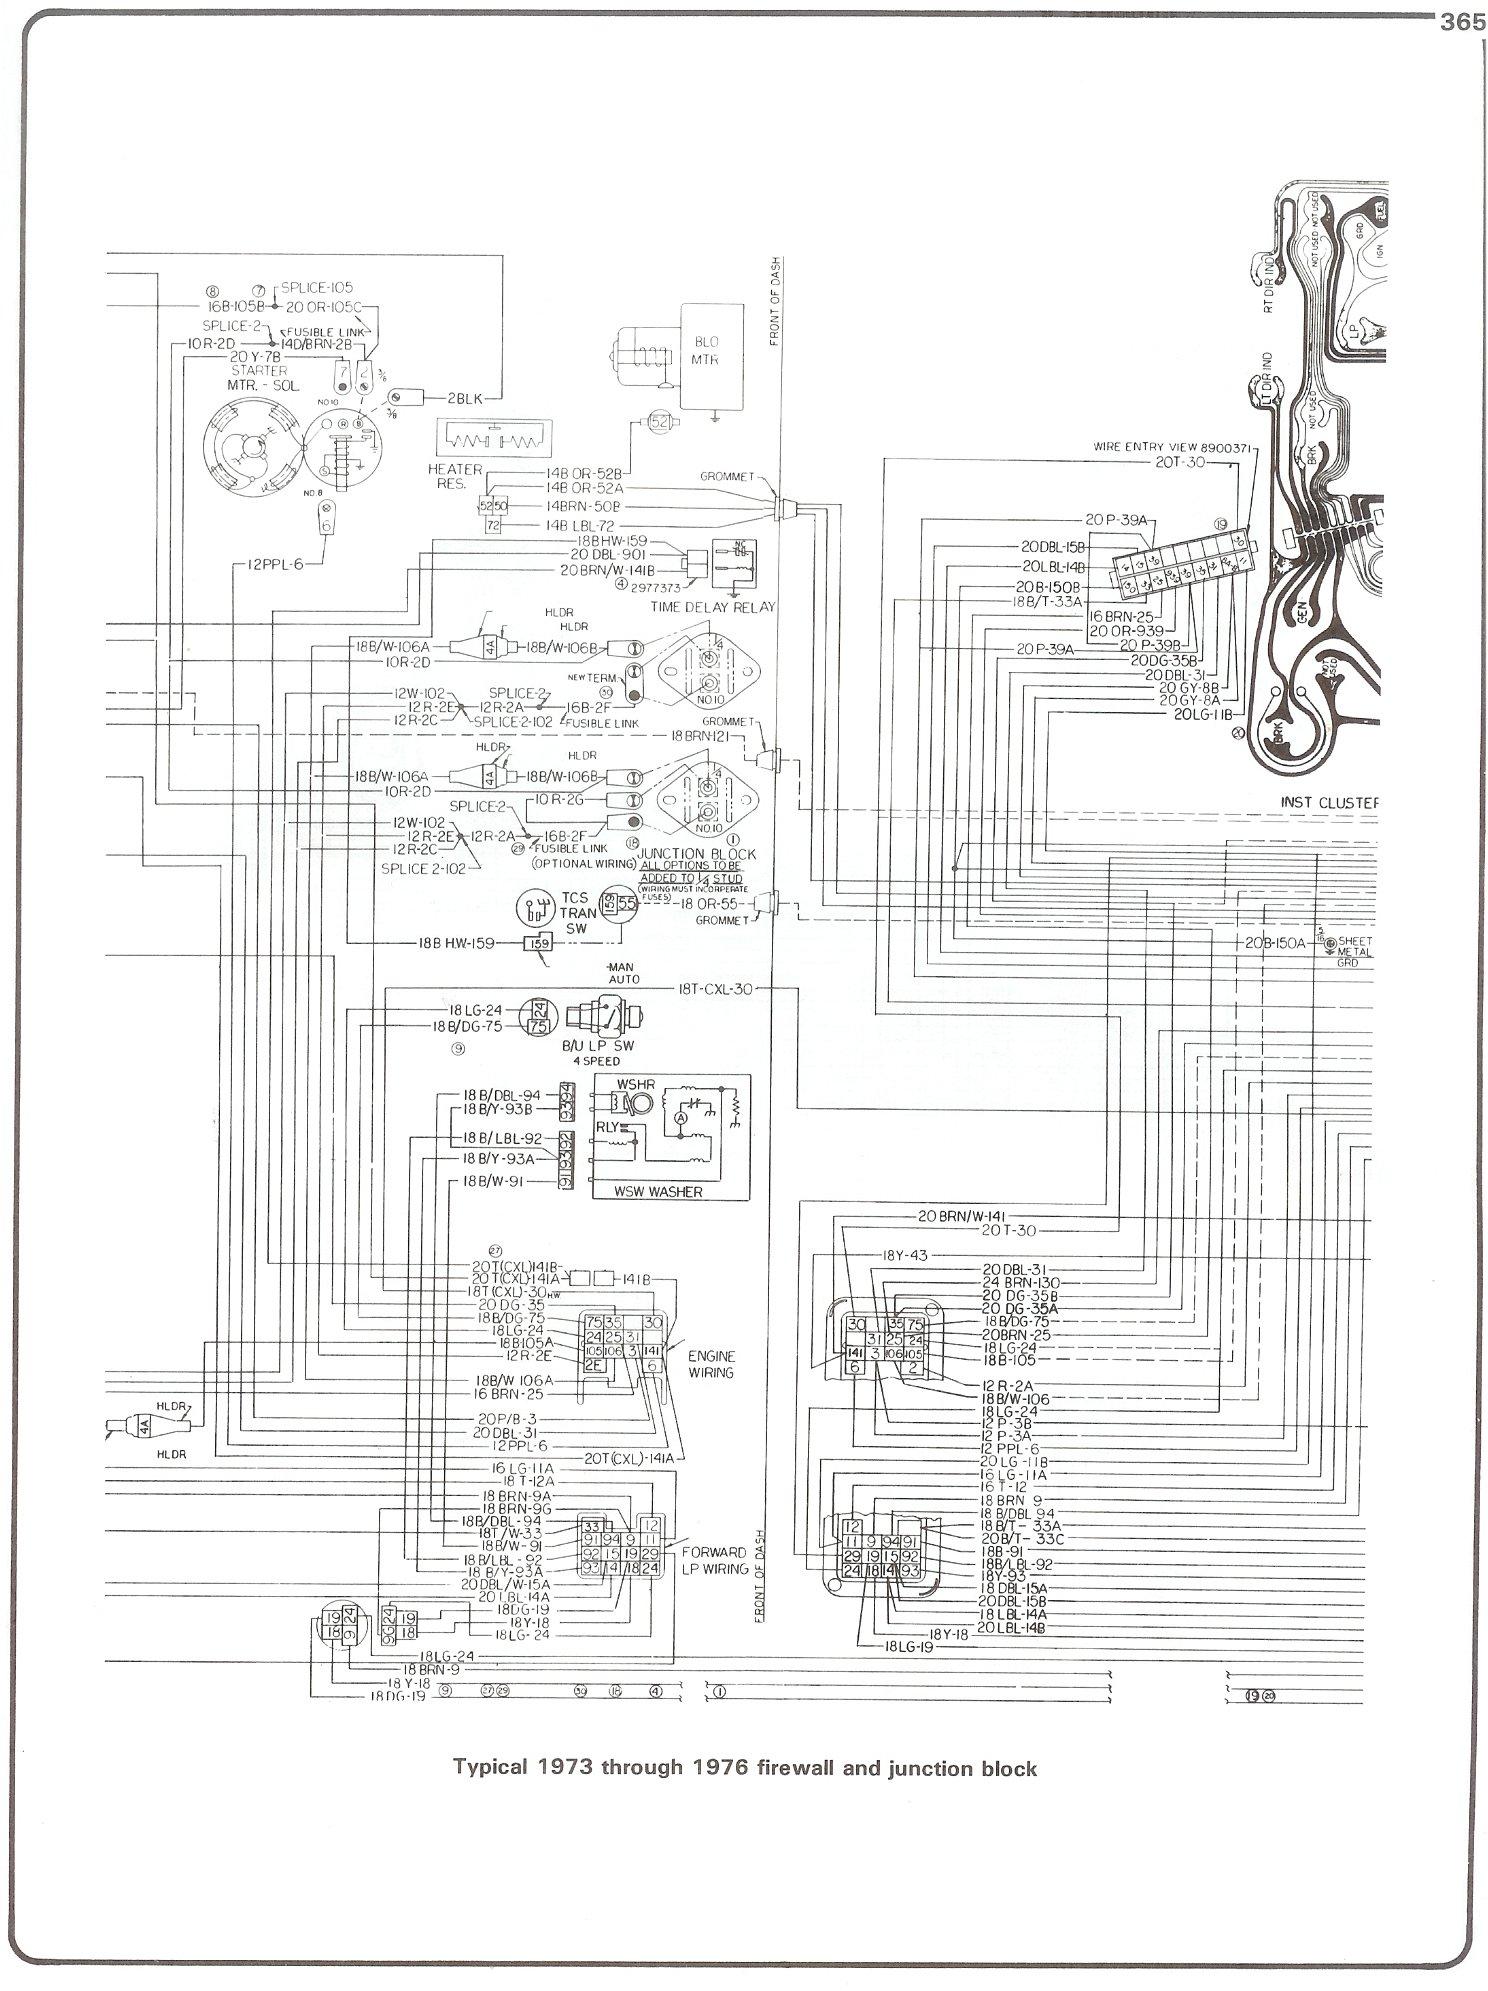 Superb 1978 Chevrolet Fuse Box Wiring Diagram Tutorial Wiring Cloud Onicaalyptbenolwigegmohammedshrineorg